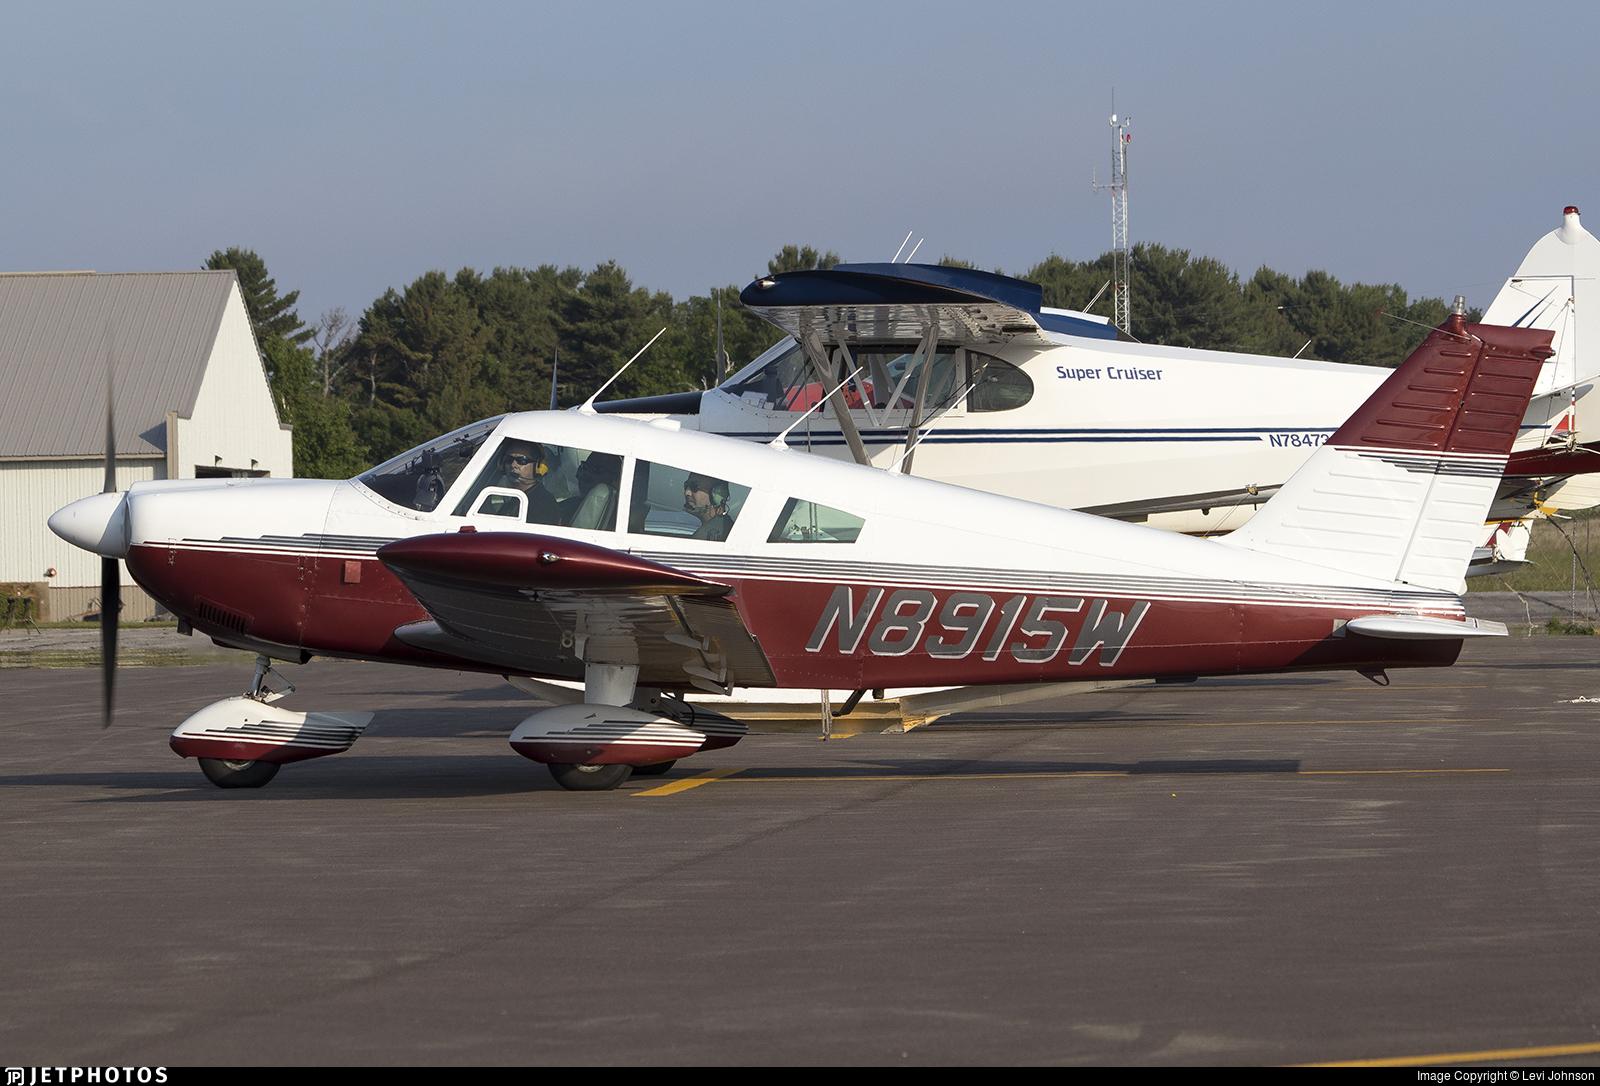 N8915W | Piper PA-28-235 Cherokee | Private | Levi Johnson | JetPhotos